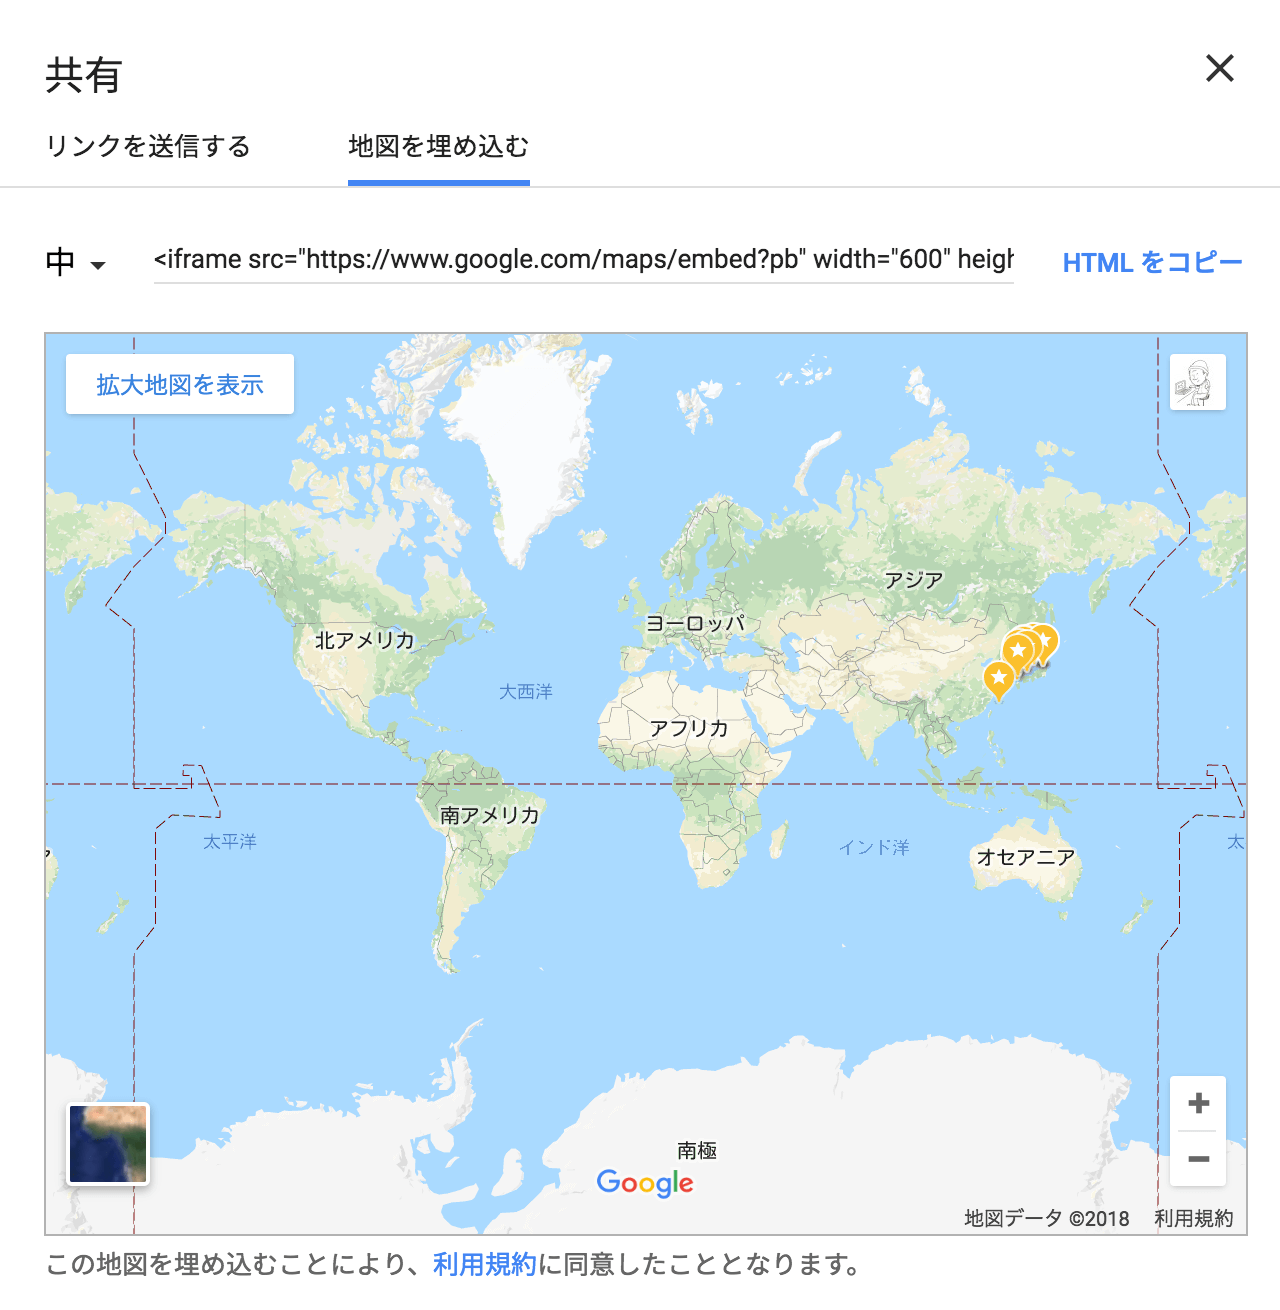 Google Mapsの埋め込みコードを表示する手順